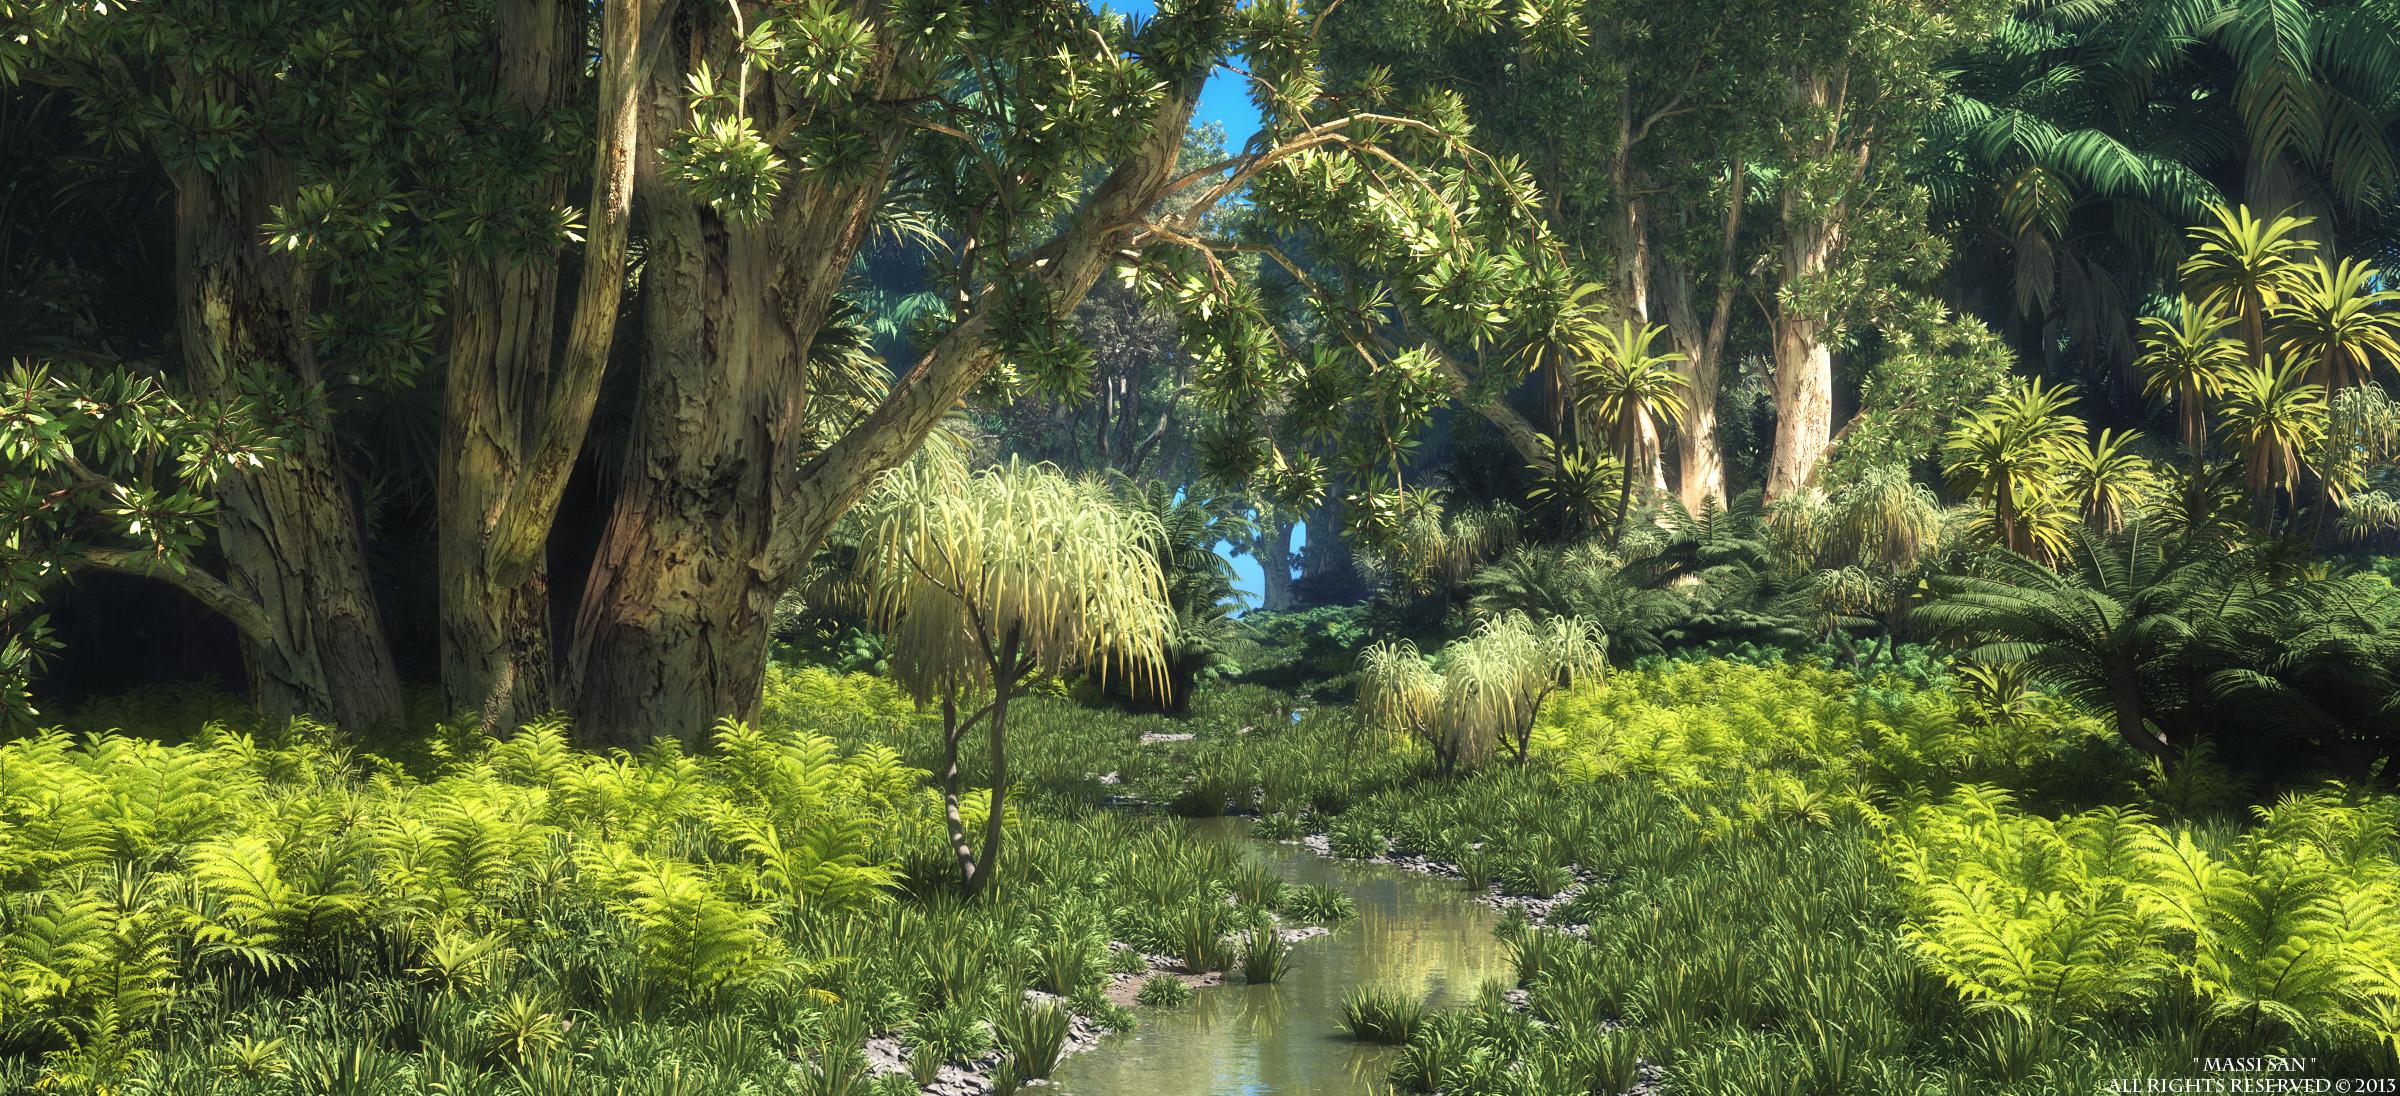 Xfrog | March 2015 - Massi San | Jungle Stream 2